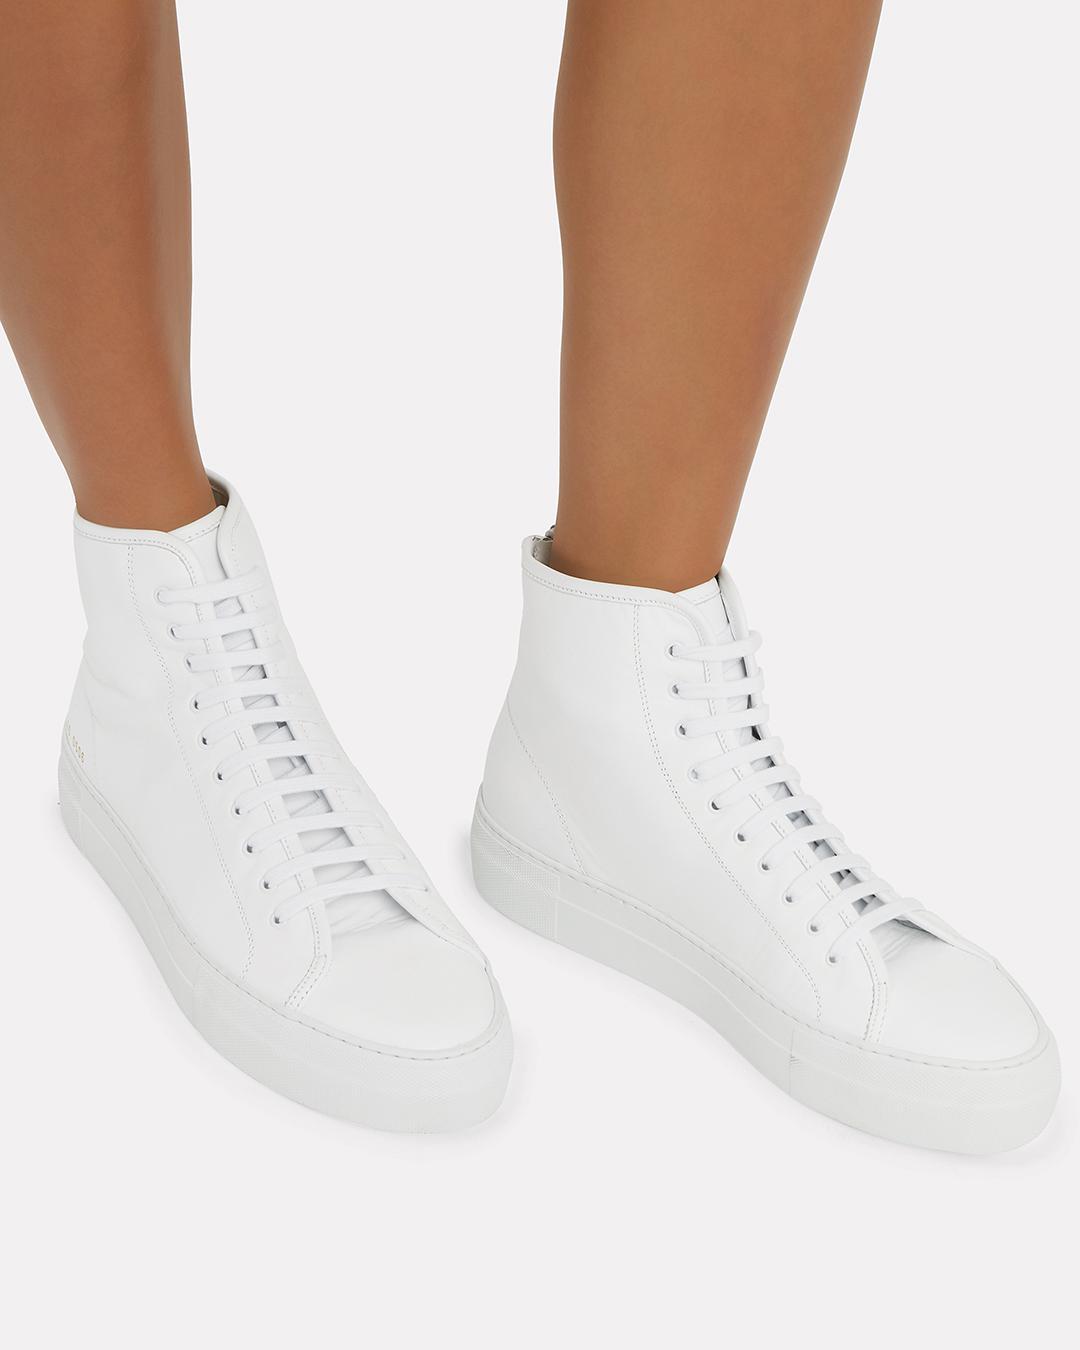 White Tournament High Super Sneakers